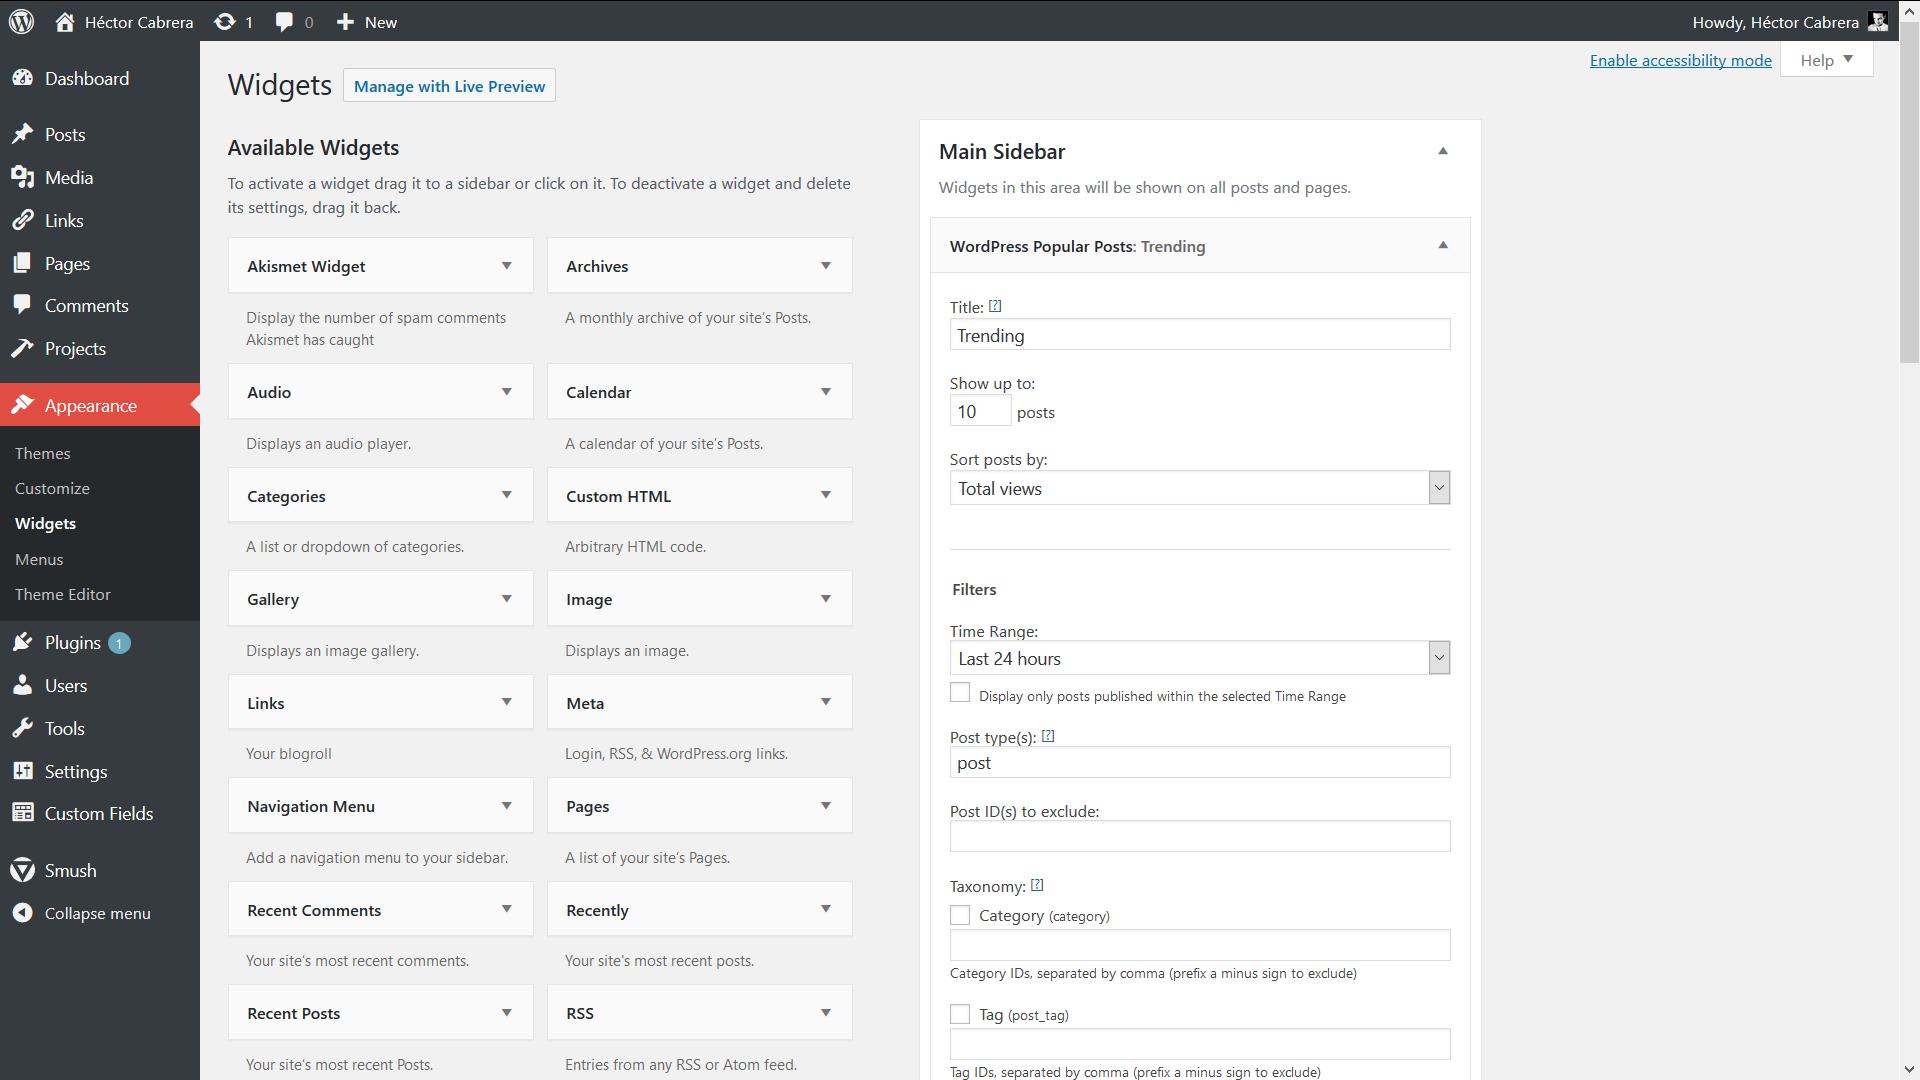 The WordPress Popular Posts Widget.